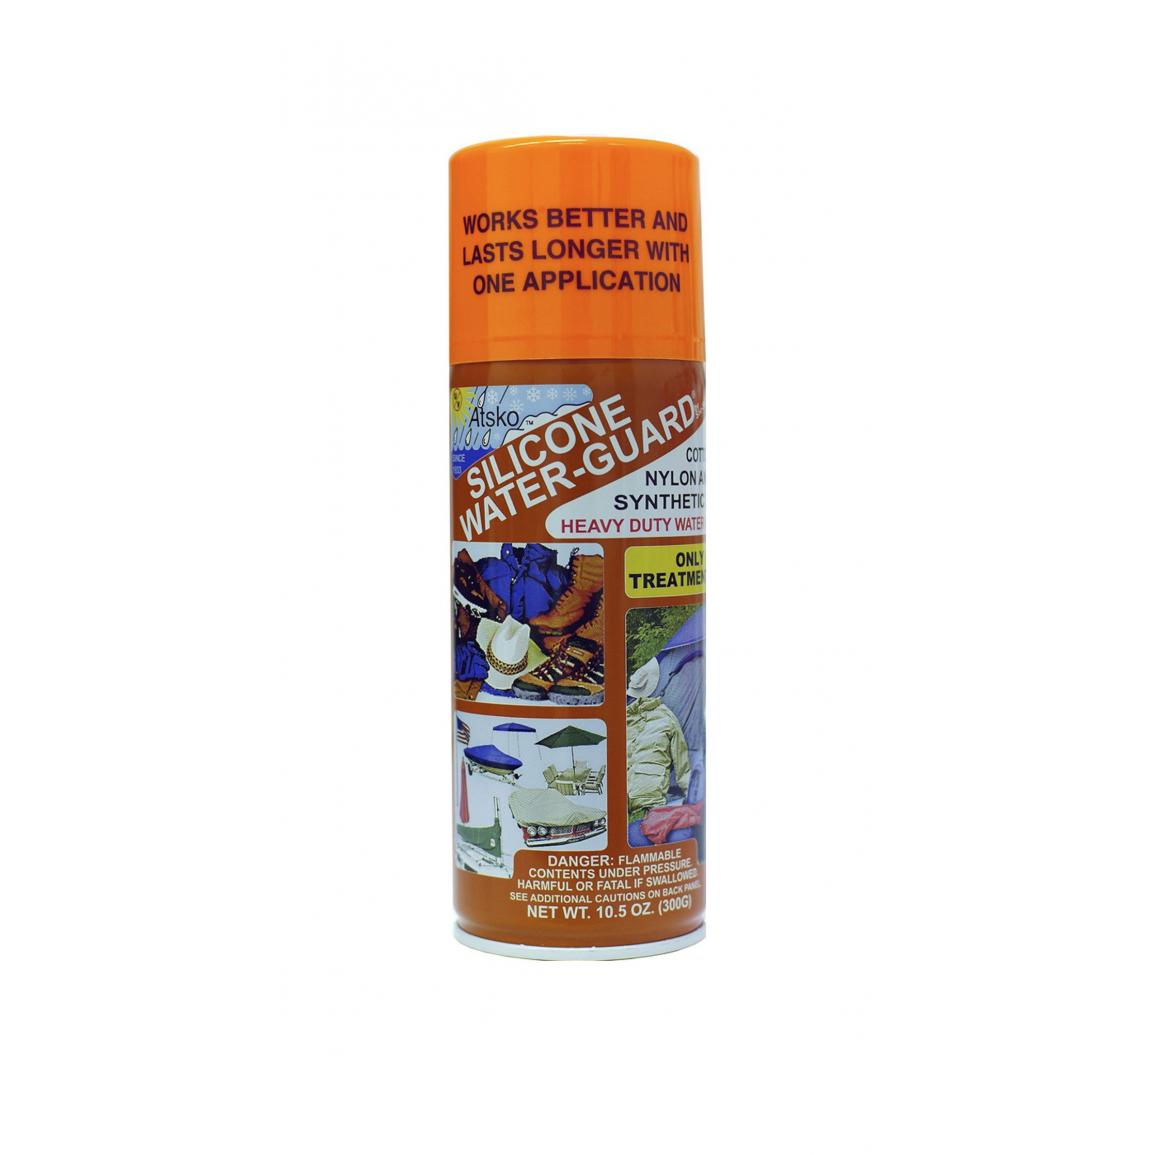 SILICONE Water Guard 2